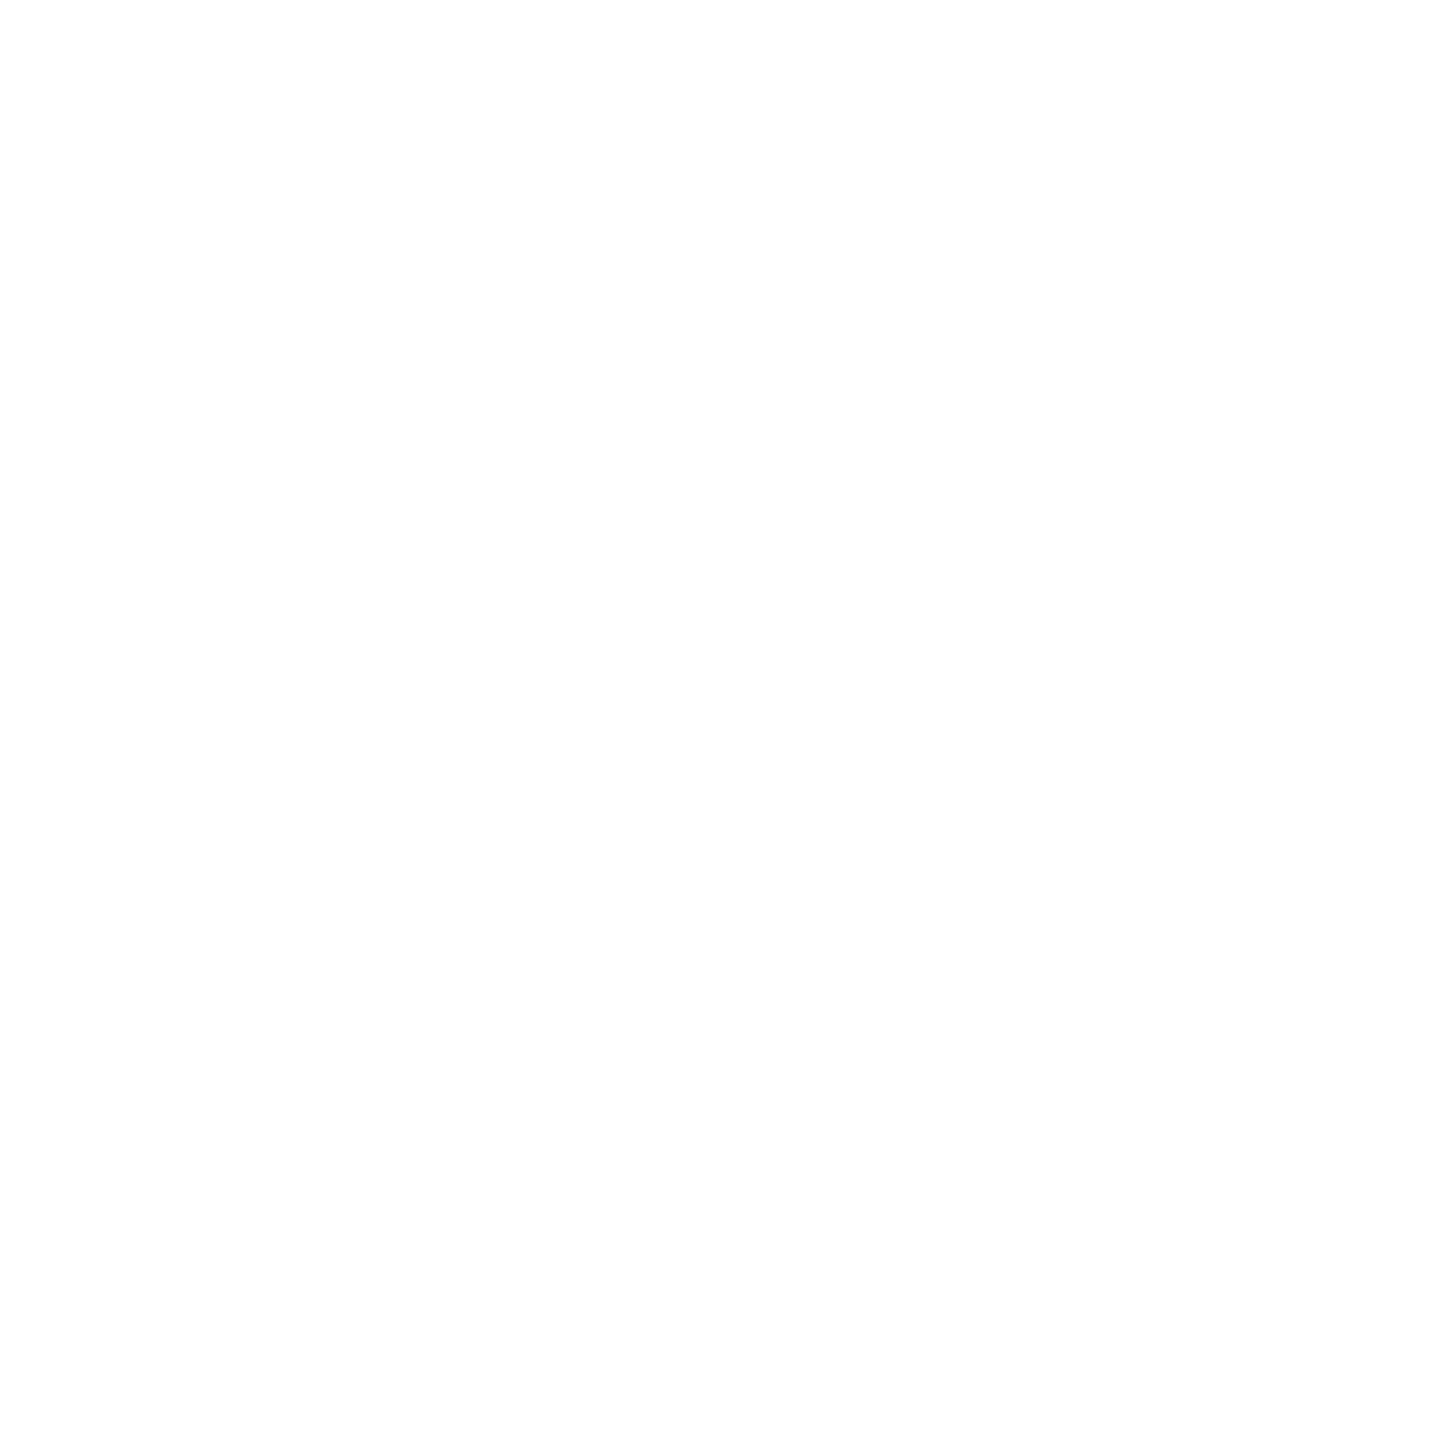 carte-pass-asbh-beziers-auto-moto